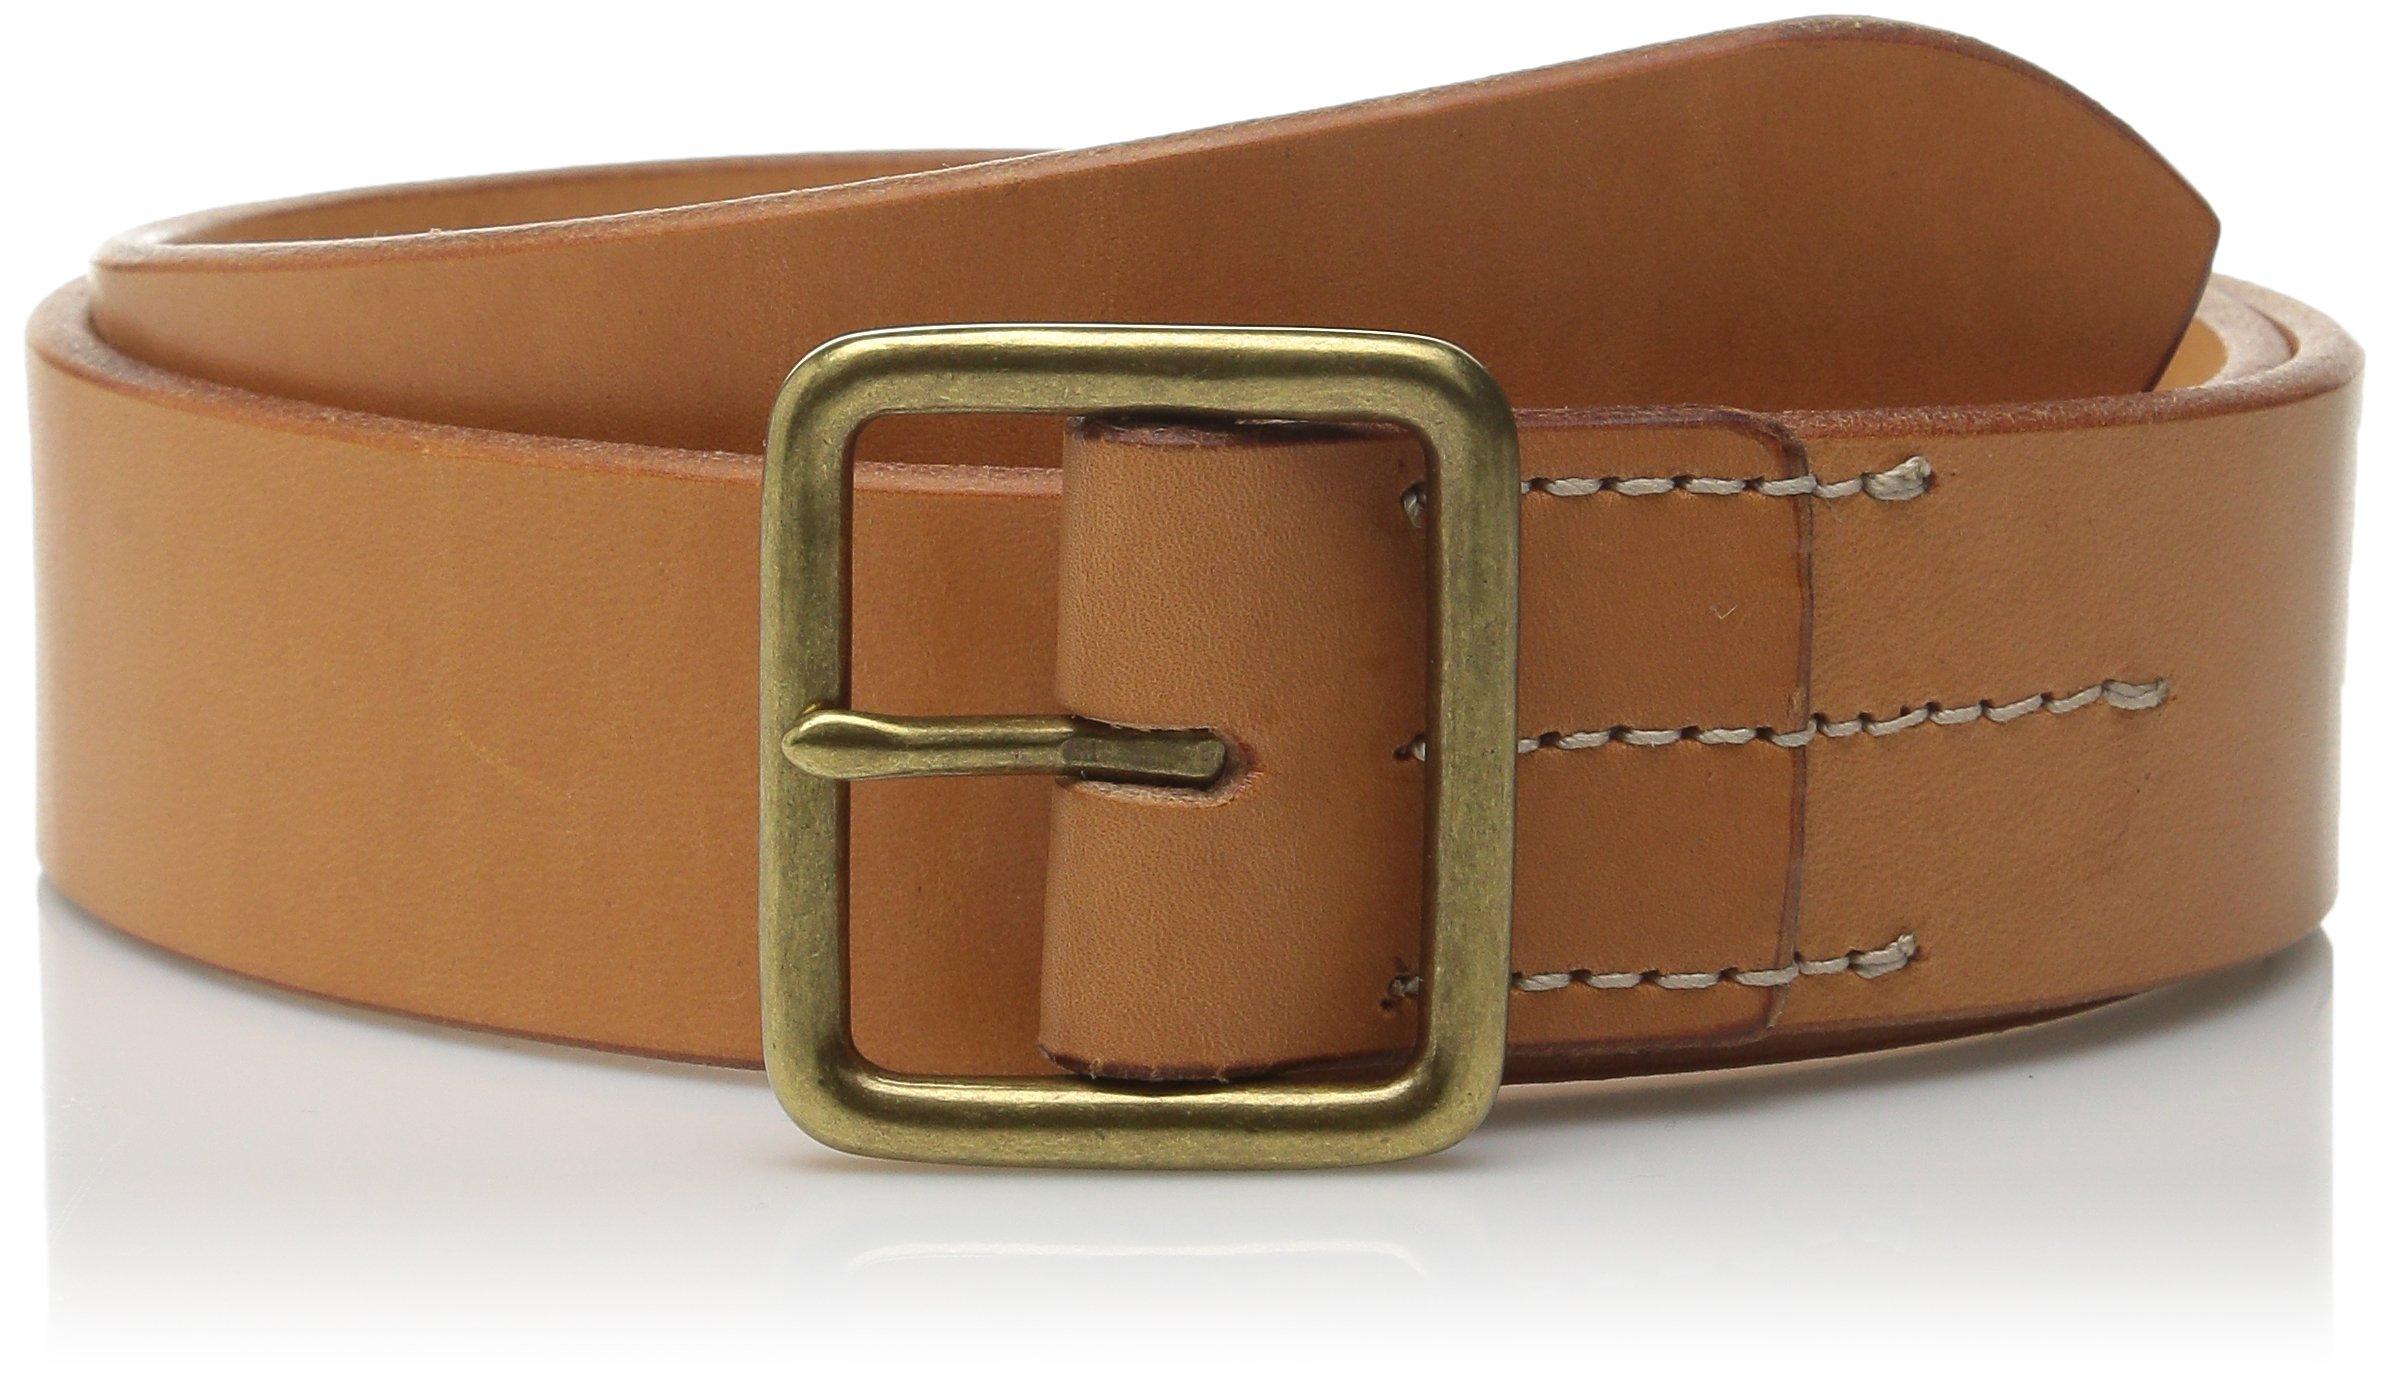 Red Wing Heritage Leather Belt, Tan Veg Tan, 38